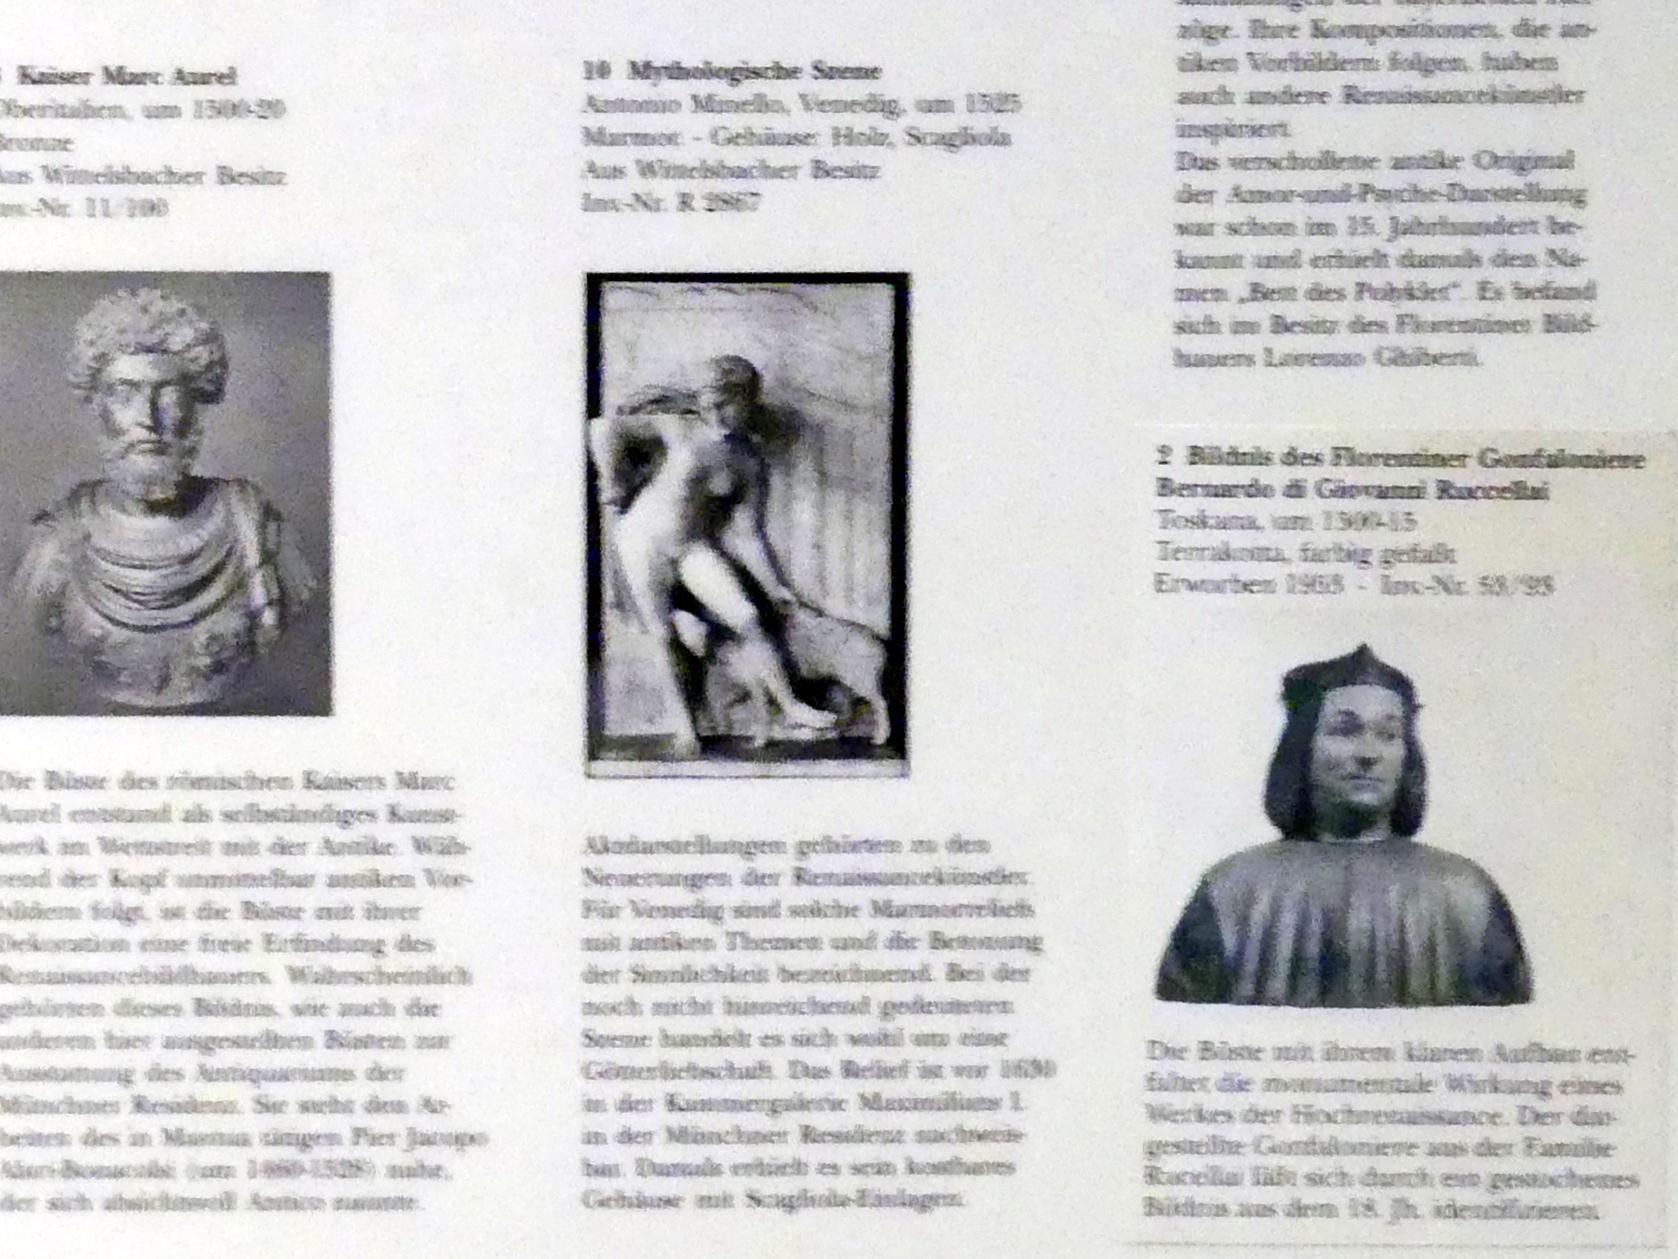 Antonio Minello: Mytologische Szene, um 1525, Bild 2/2